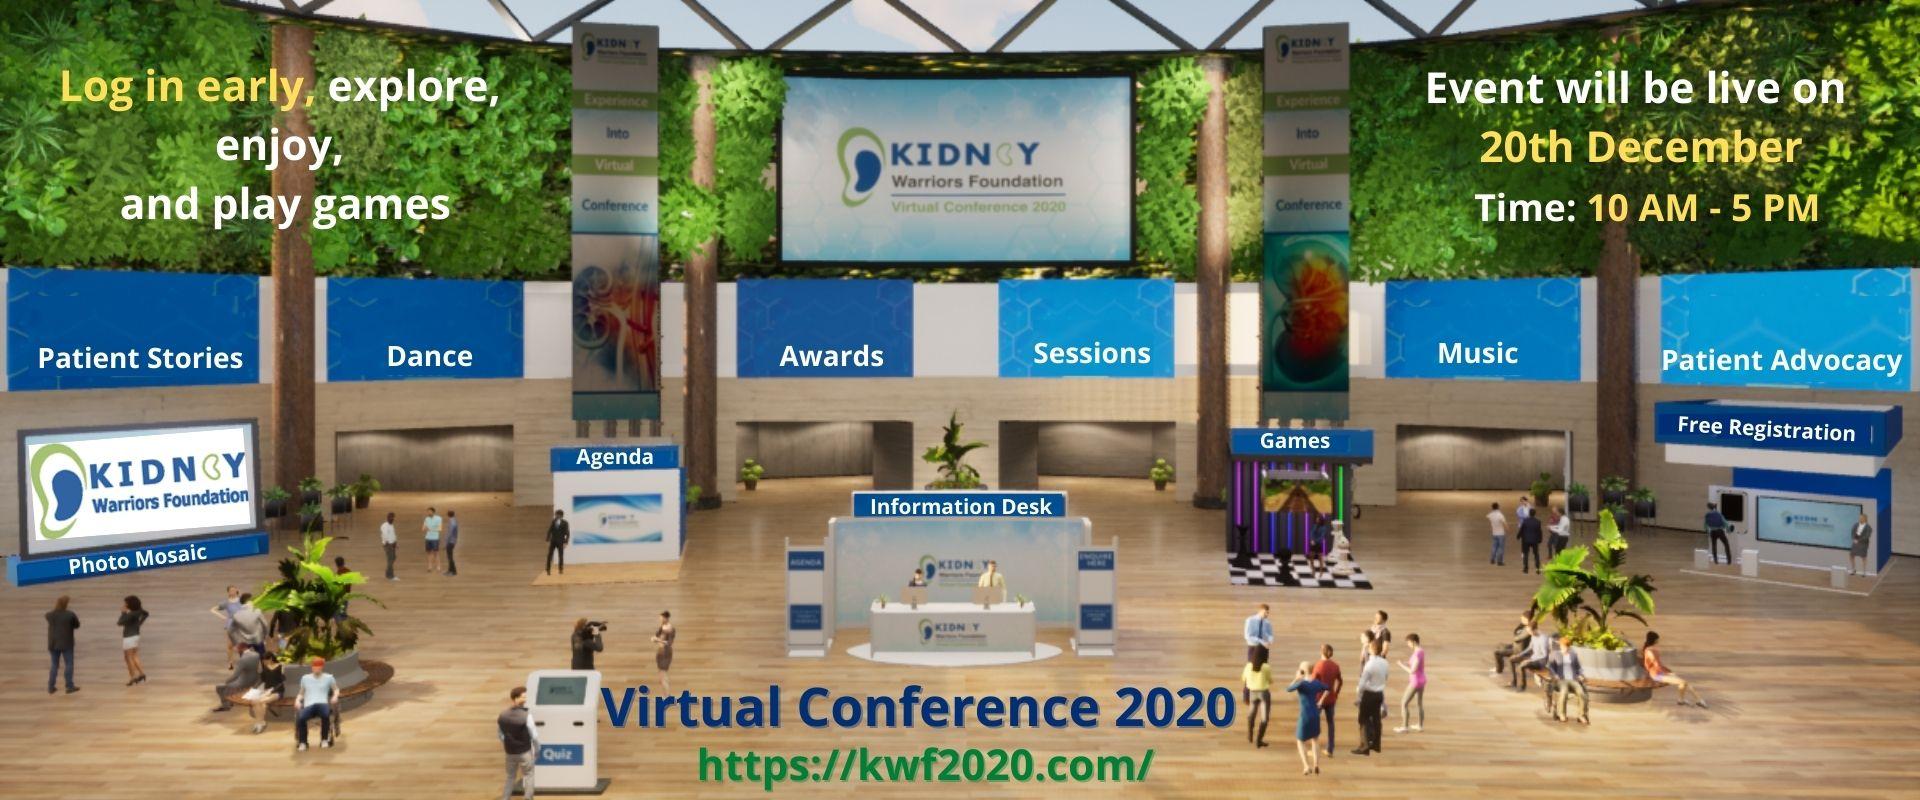 Virtual Conference 2020